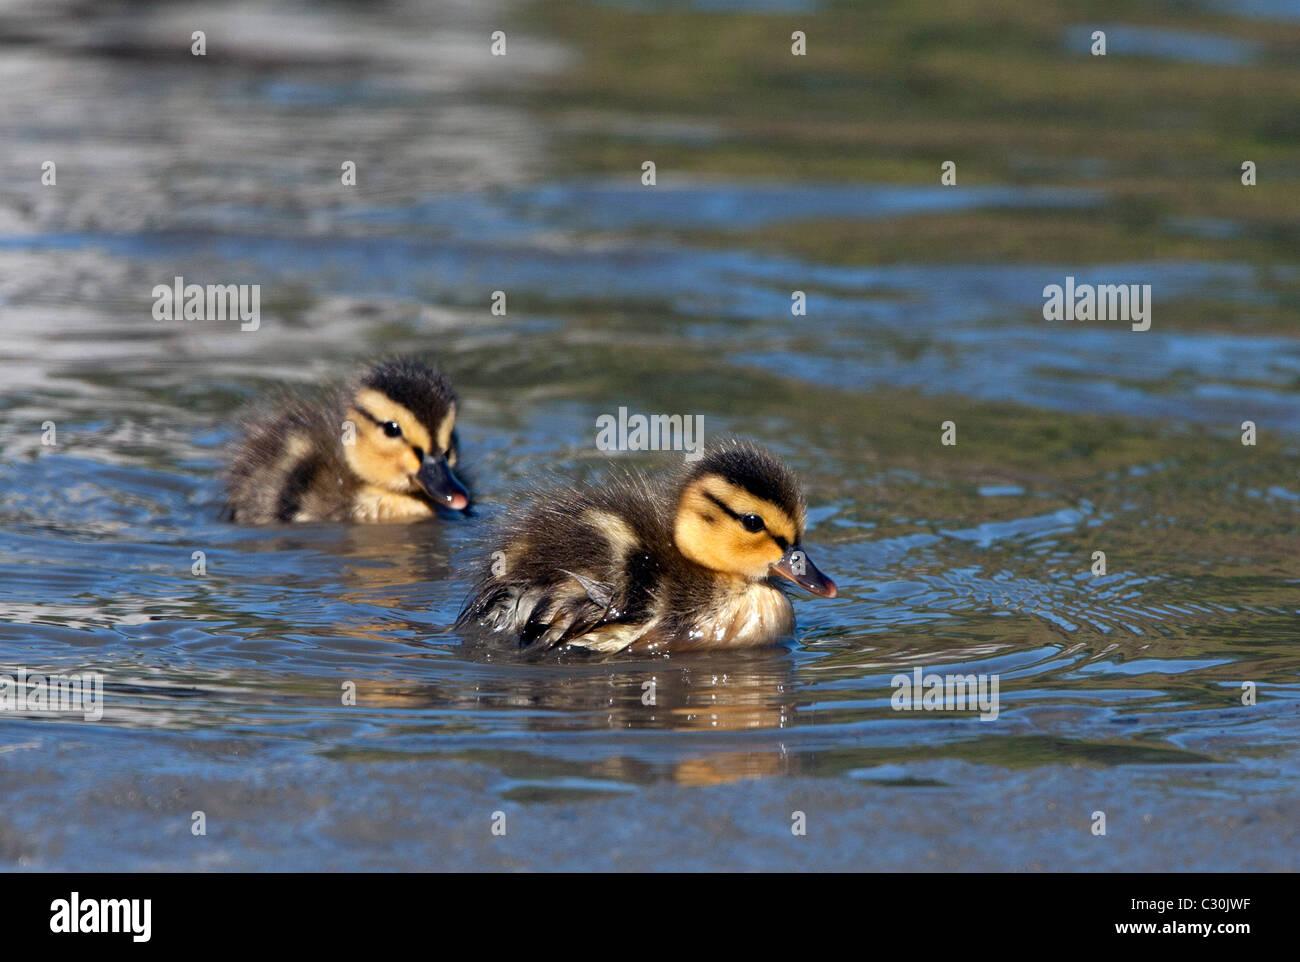 Mallard Ducklings Swimming - Stock Image